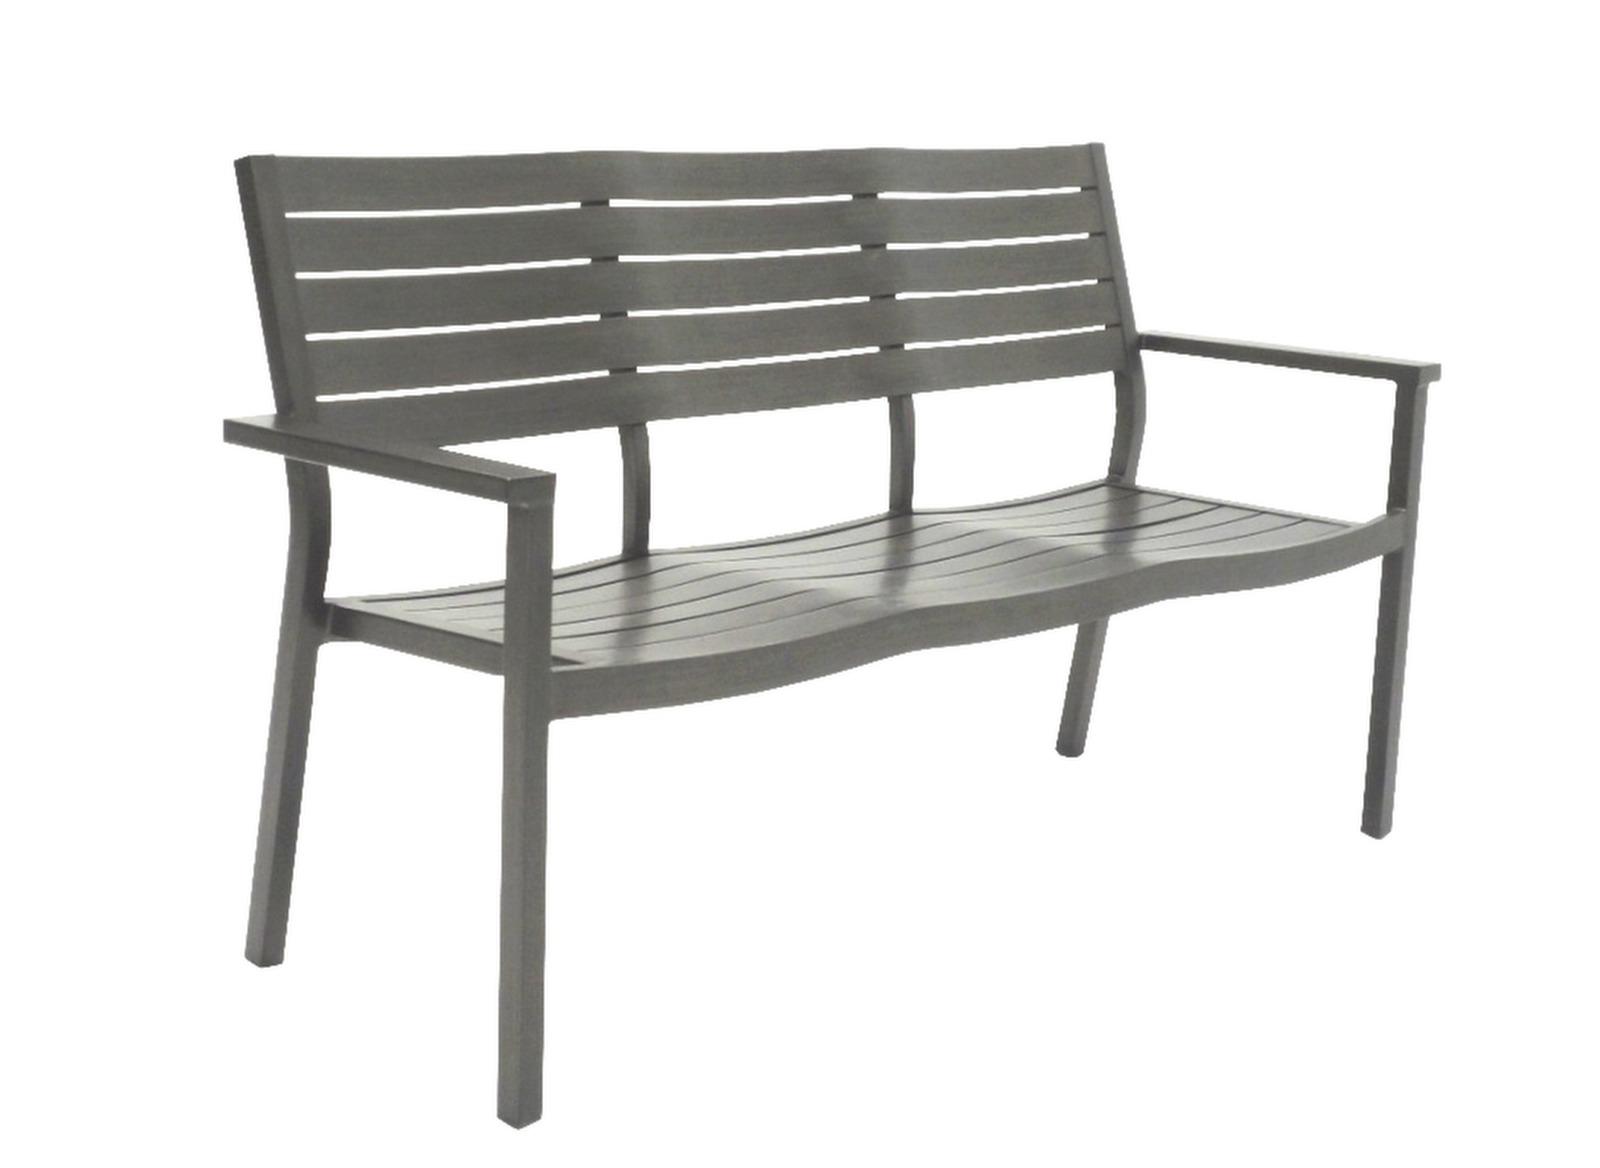 banc de jardin aluminium 3 places latino oc o proloisirs. Black Bedroom Furniture Sets. Home Design Ideas